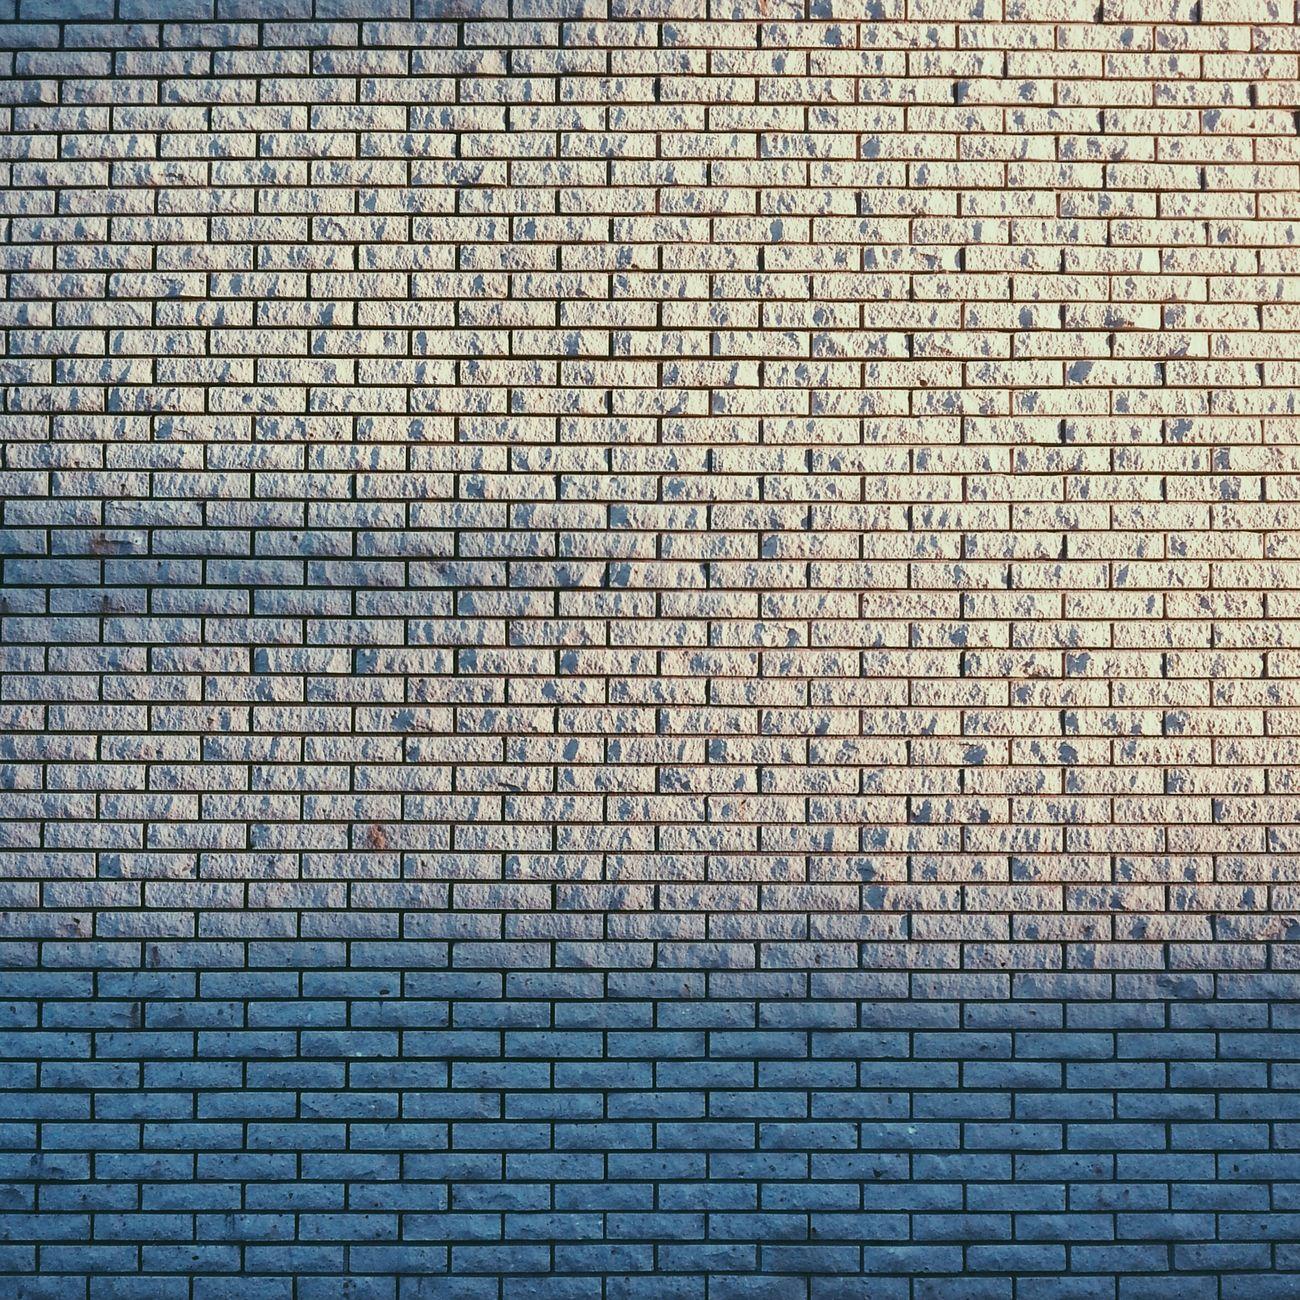 Precision Taking Photos Bricks Brickporn Brick Wall Photo Taking Photos Photography Enjoying Life Artphoto